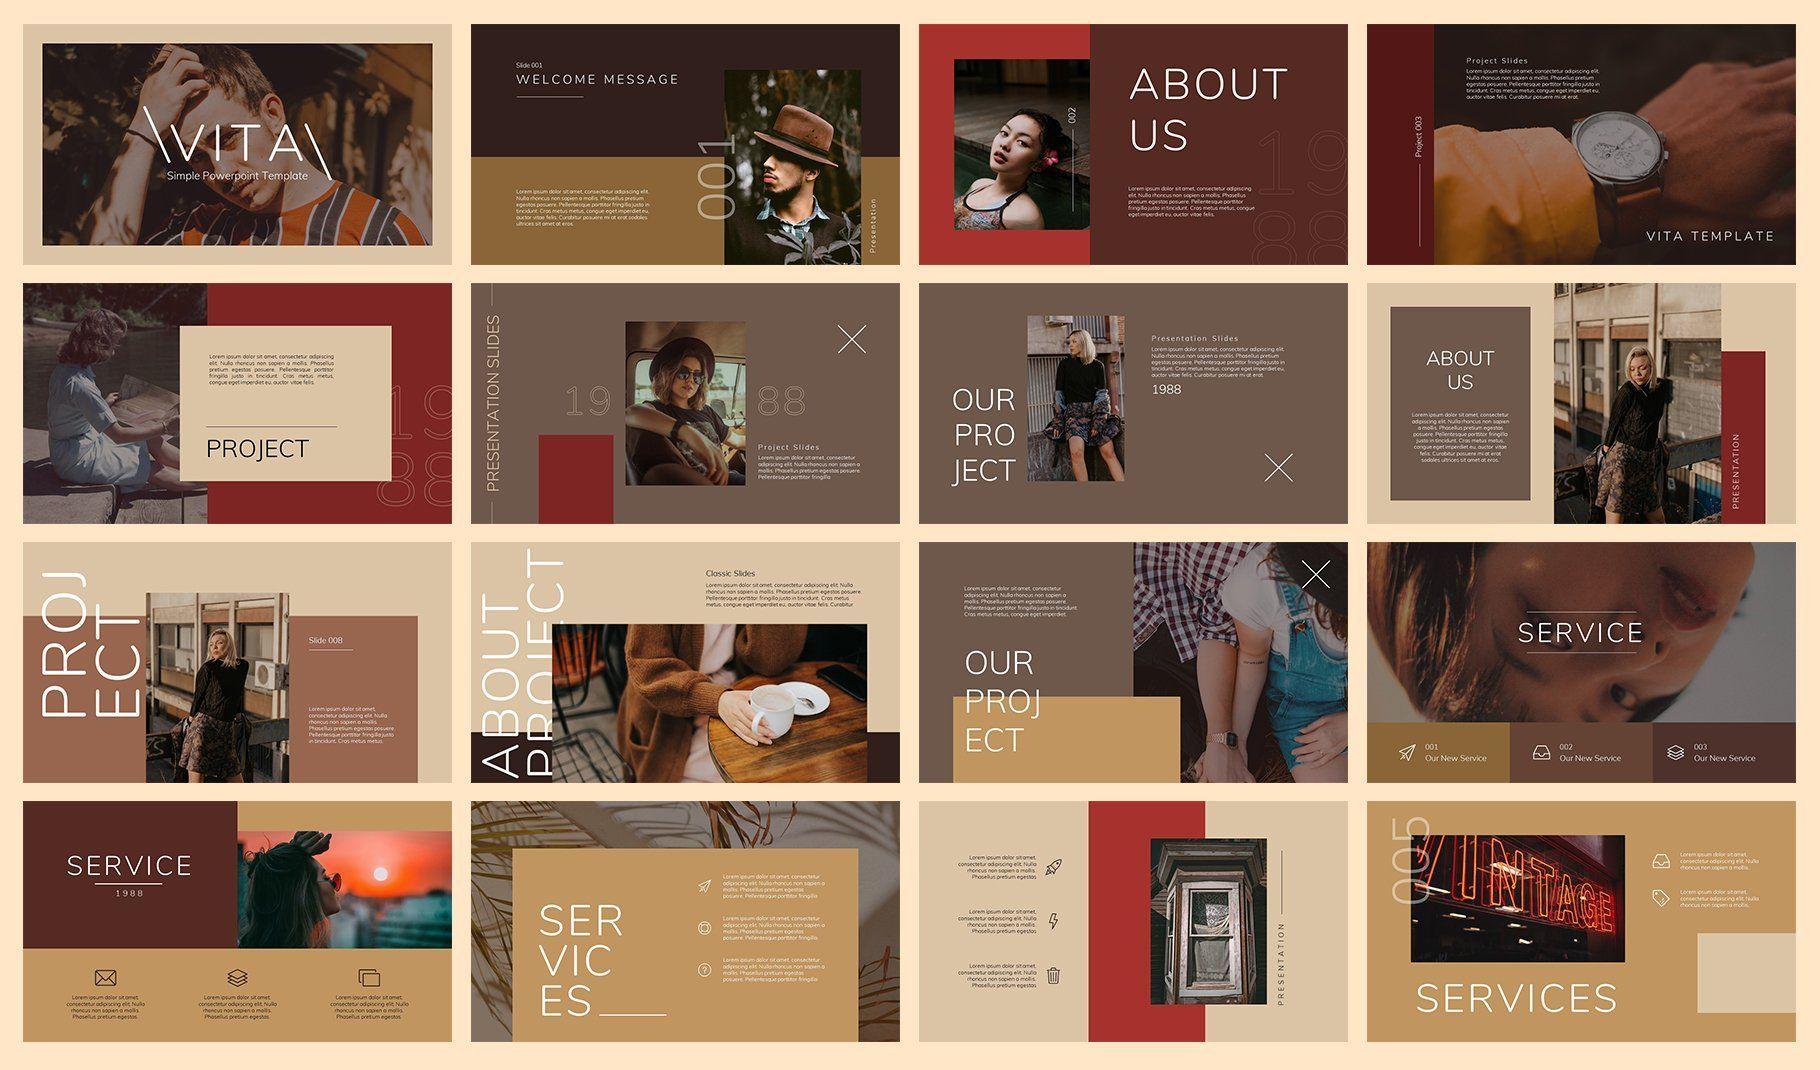 Vita Vintage Google Slides By Semesta Studio Presentations Design In 2020 Simple Business Cards Powerpoint Slide Design